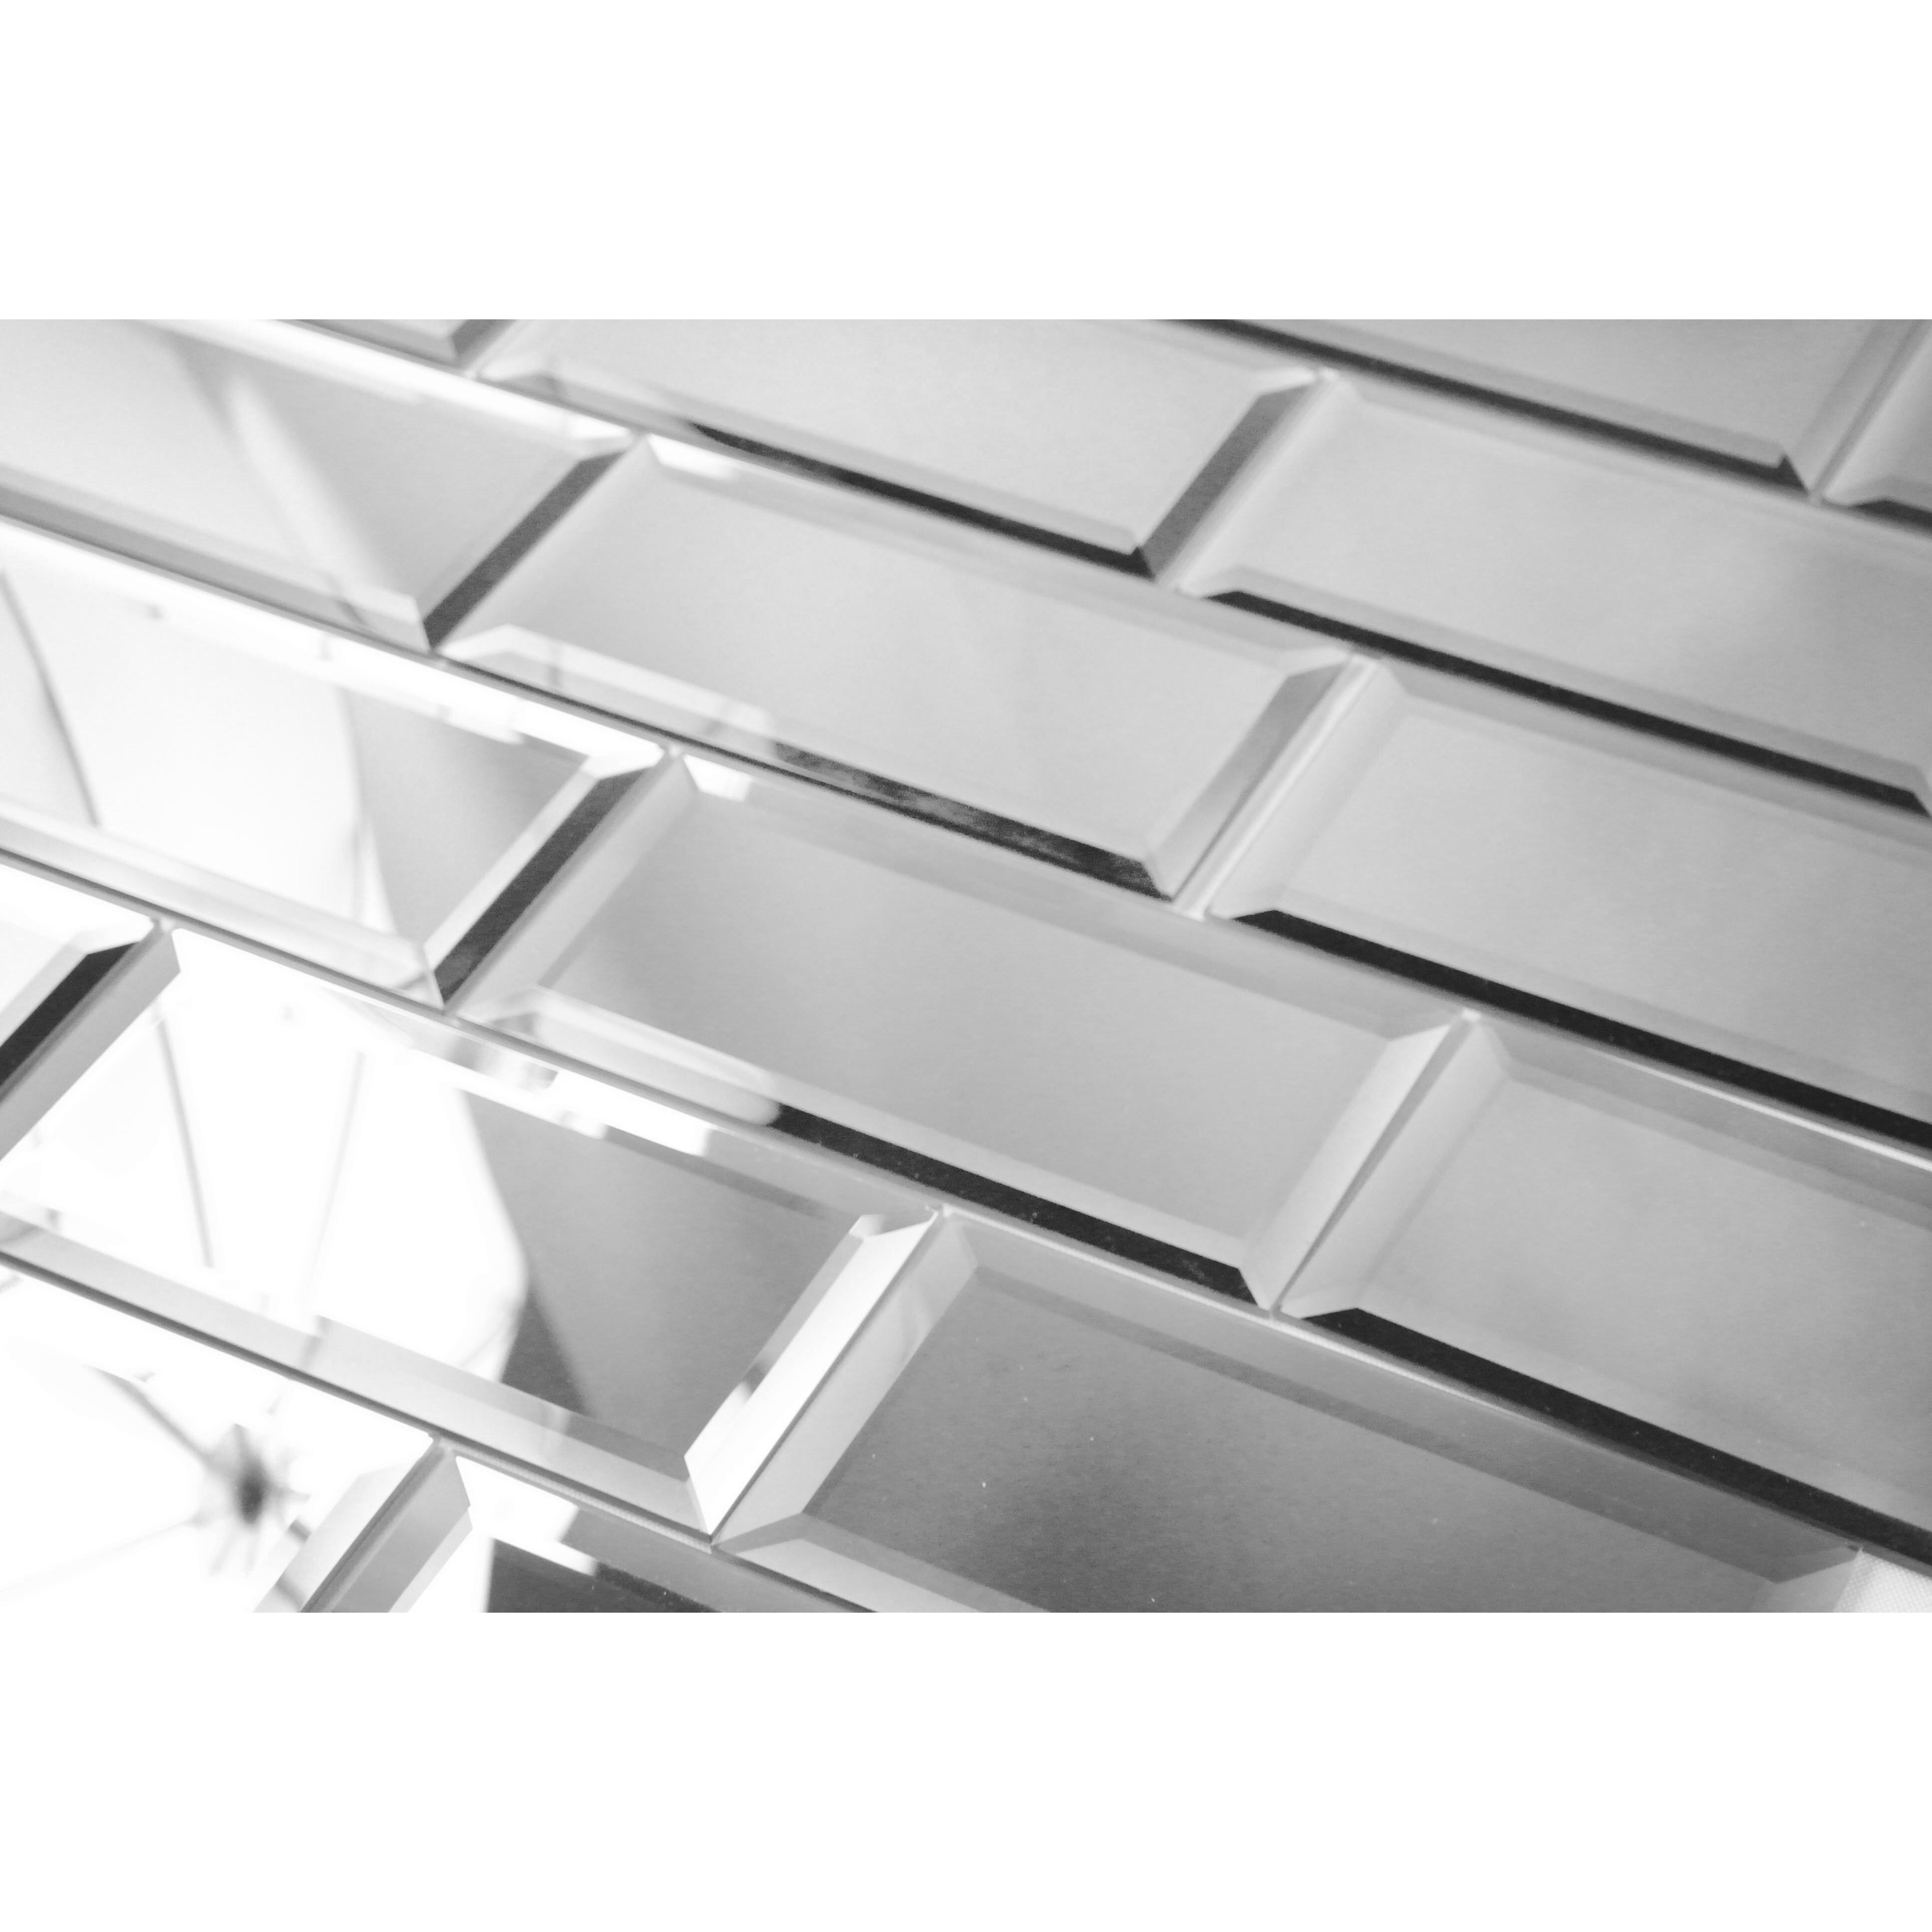 abolos echo 3 x 6 glass peel stick subway tile in silver reviews wayfair. Black Bedroom Furniture Sets. Home Design Ideas